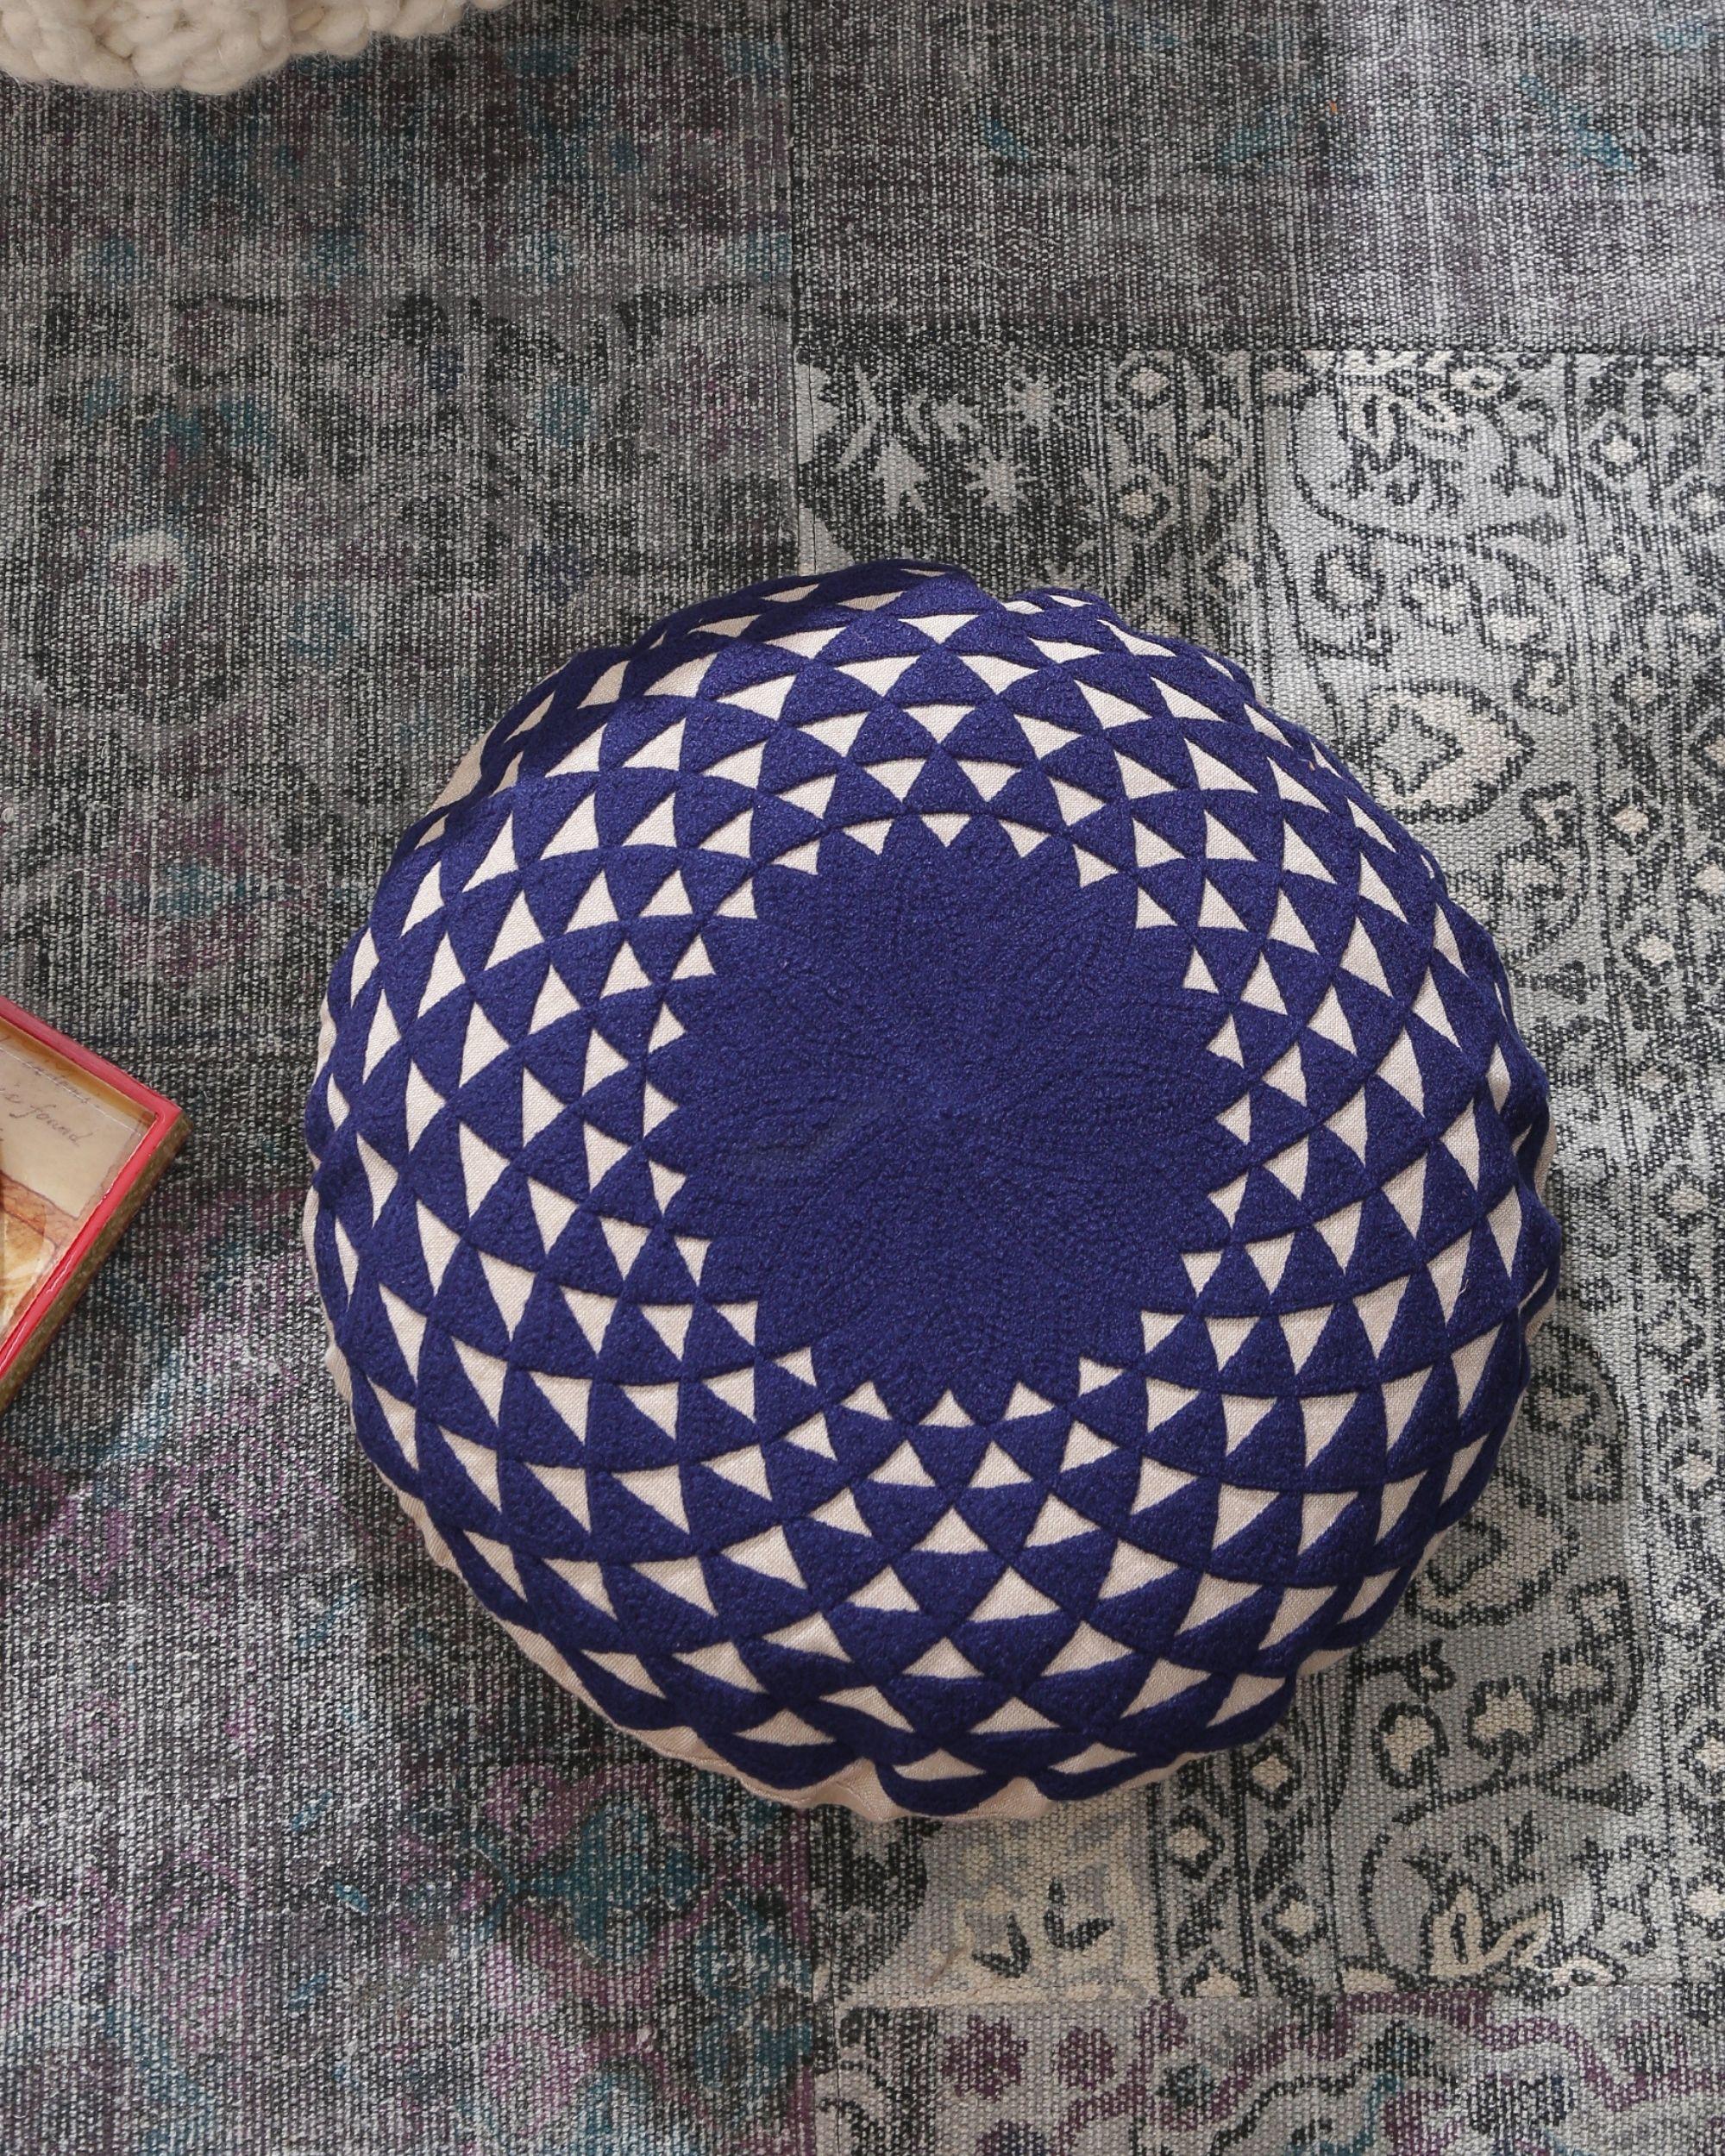 Deep blue mandala cushion cover